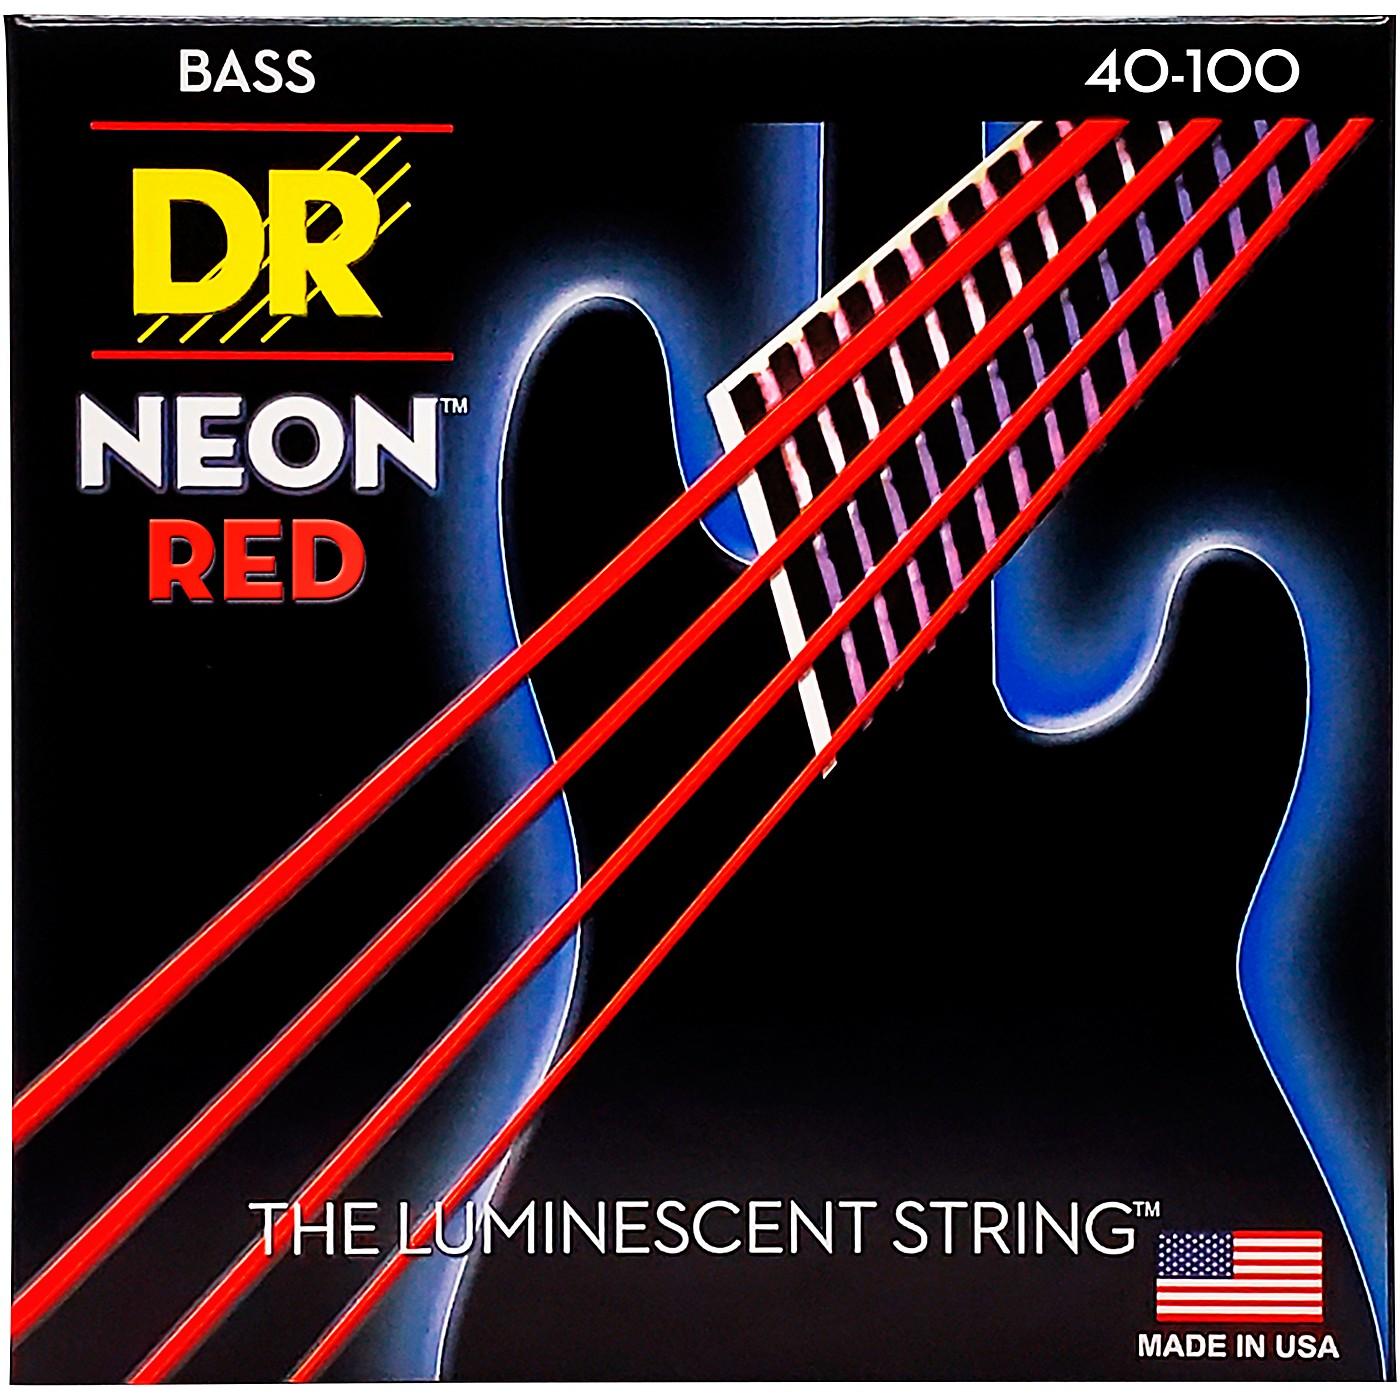 DR Strings Hi-Def NEON Red Coated Lite Bass Strings (40-100) thumbnail